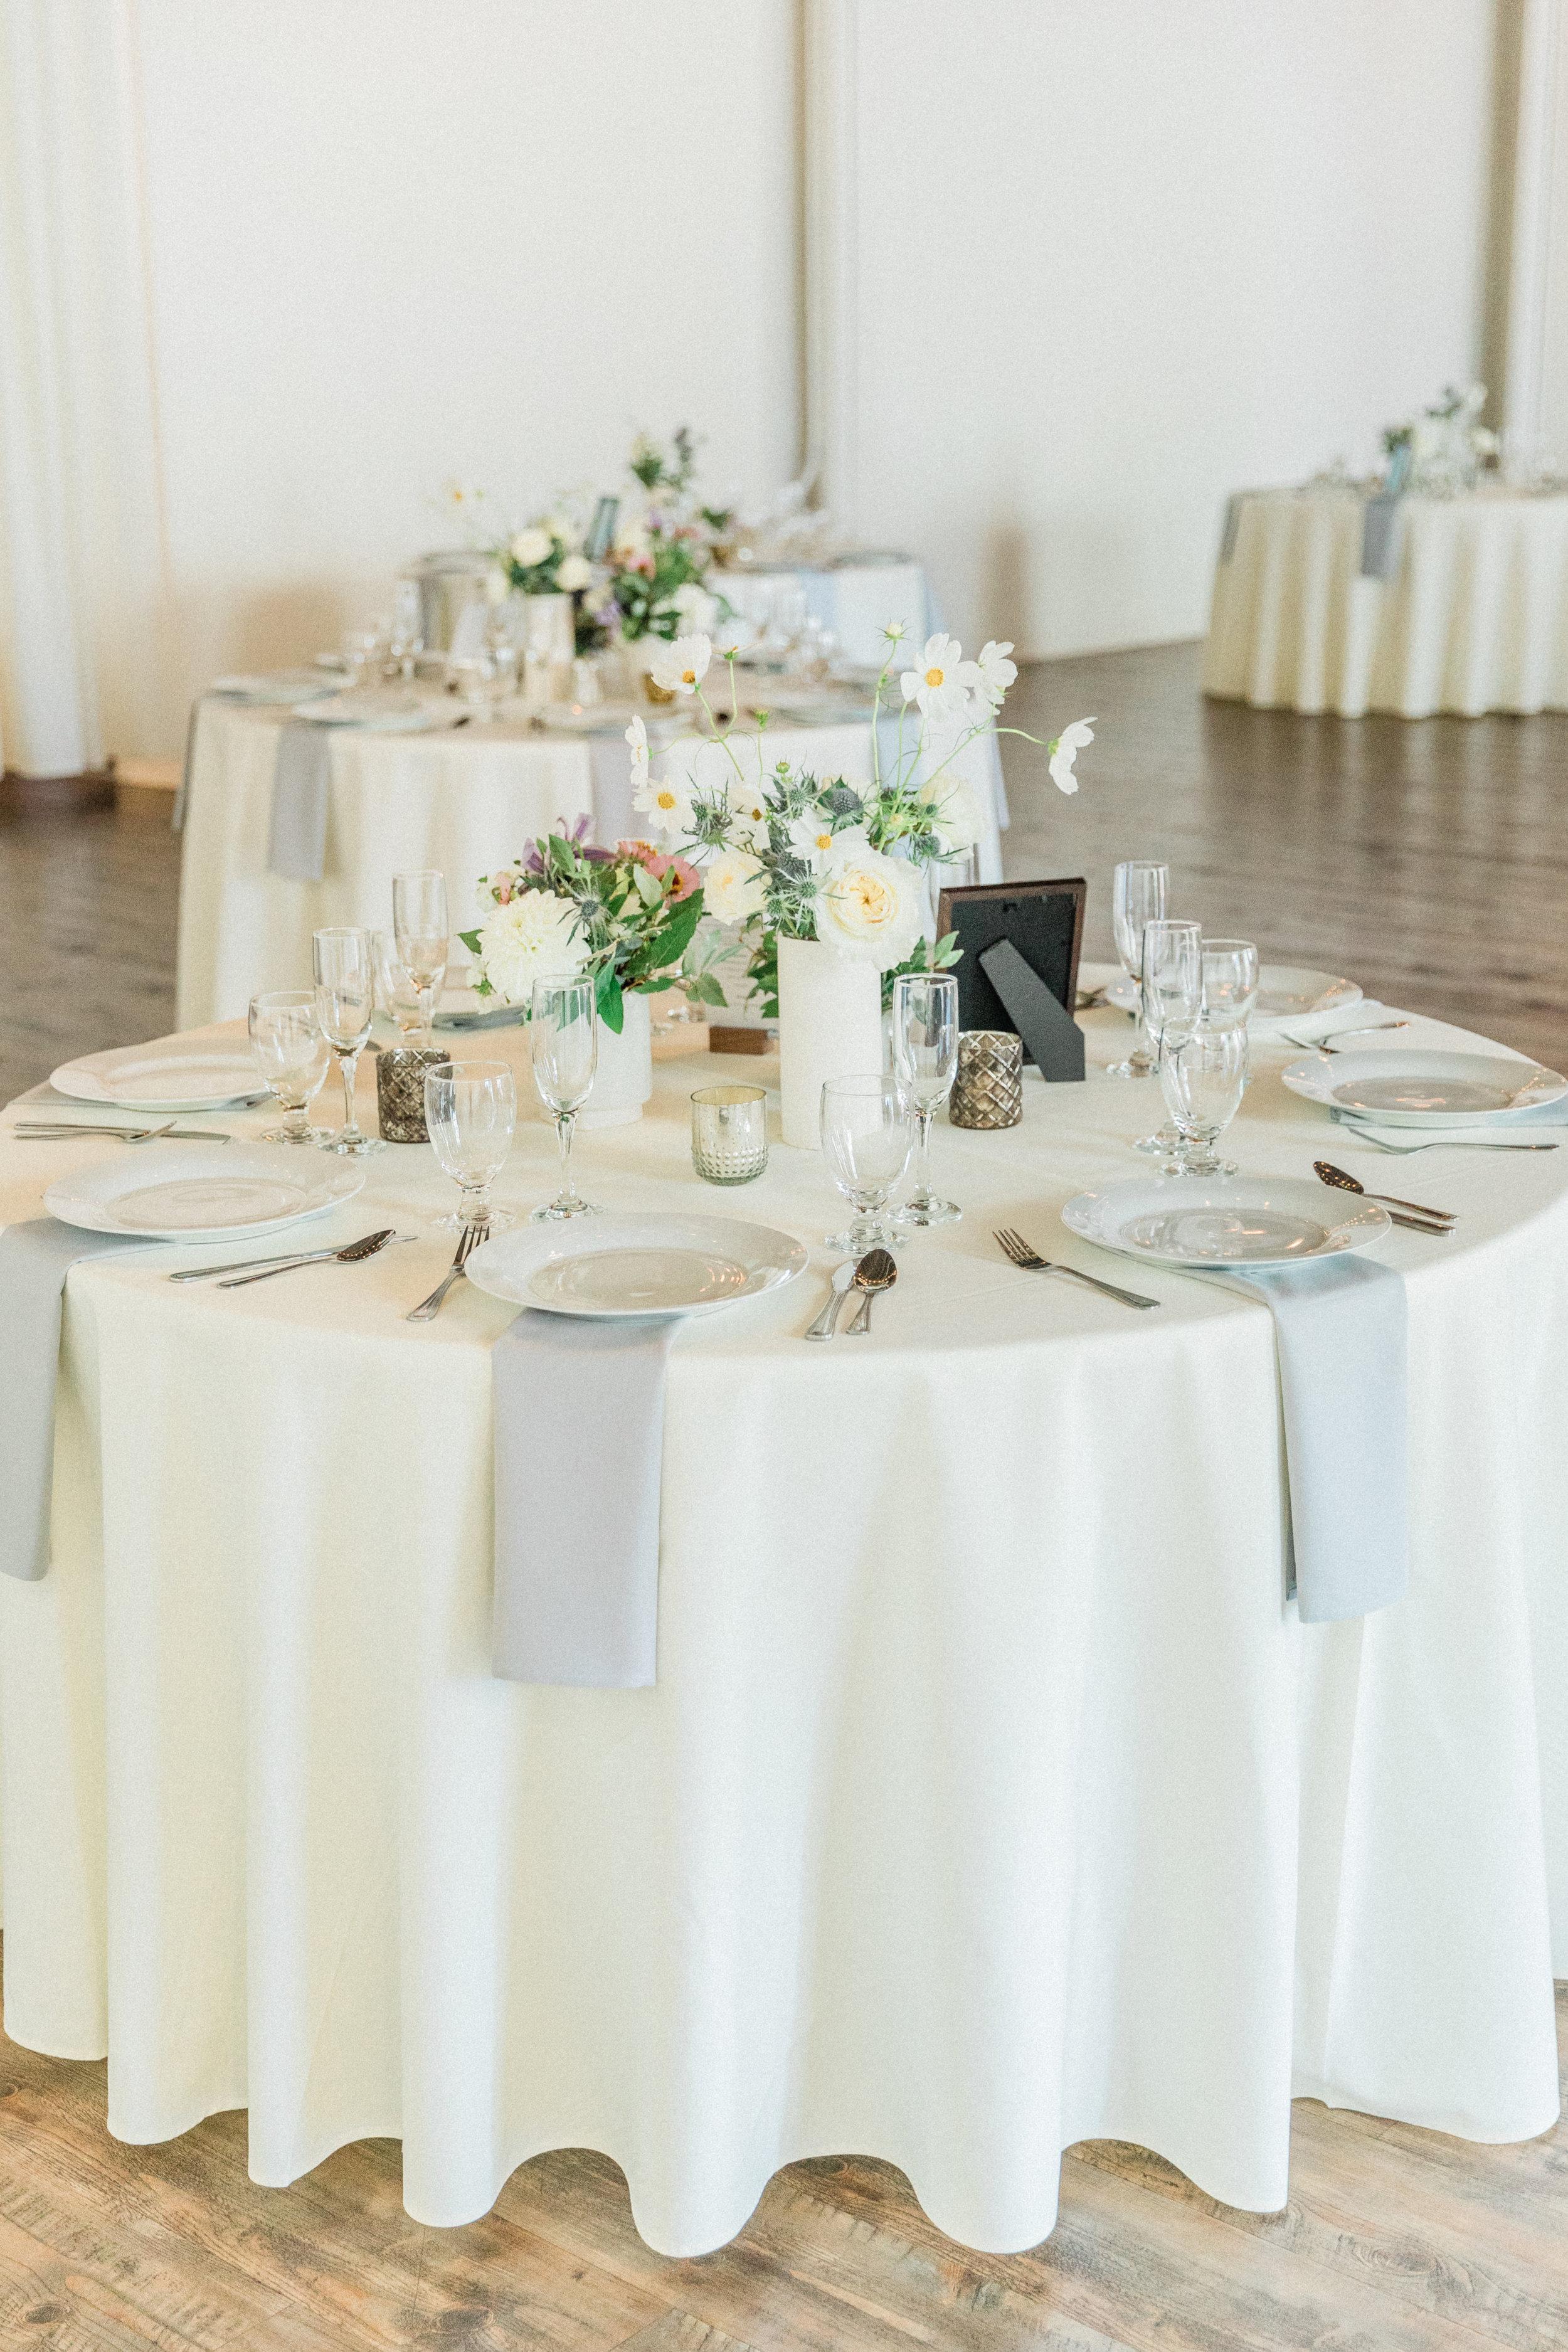 Mallory and Aaron - Married - Sneaks - Lauren Alisse Photography-29.jpg